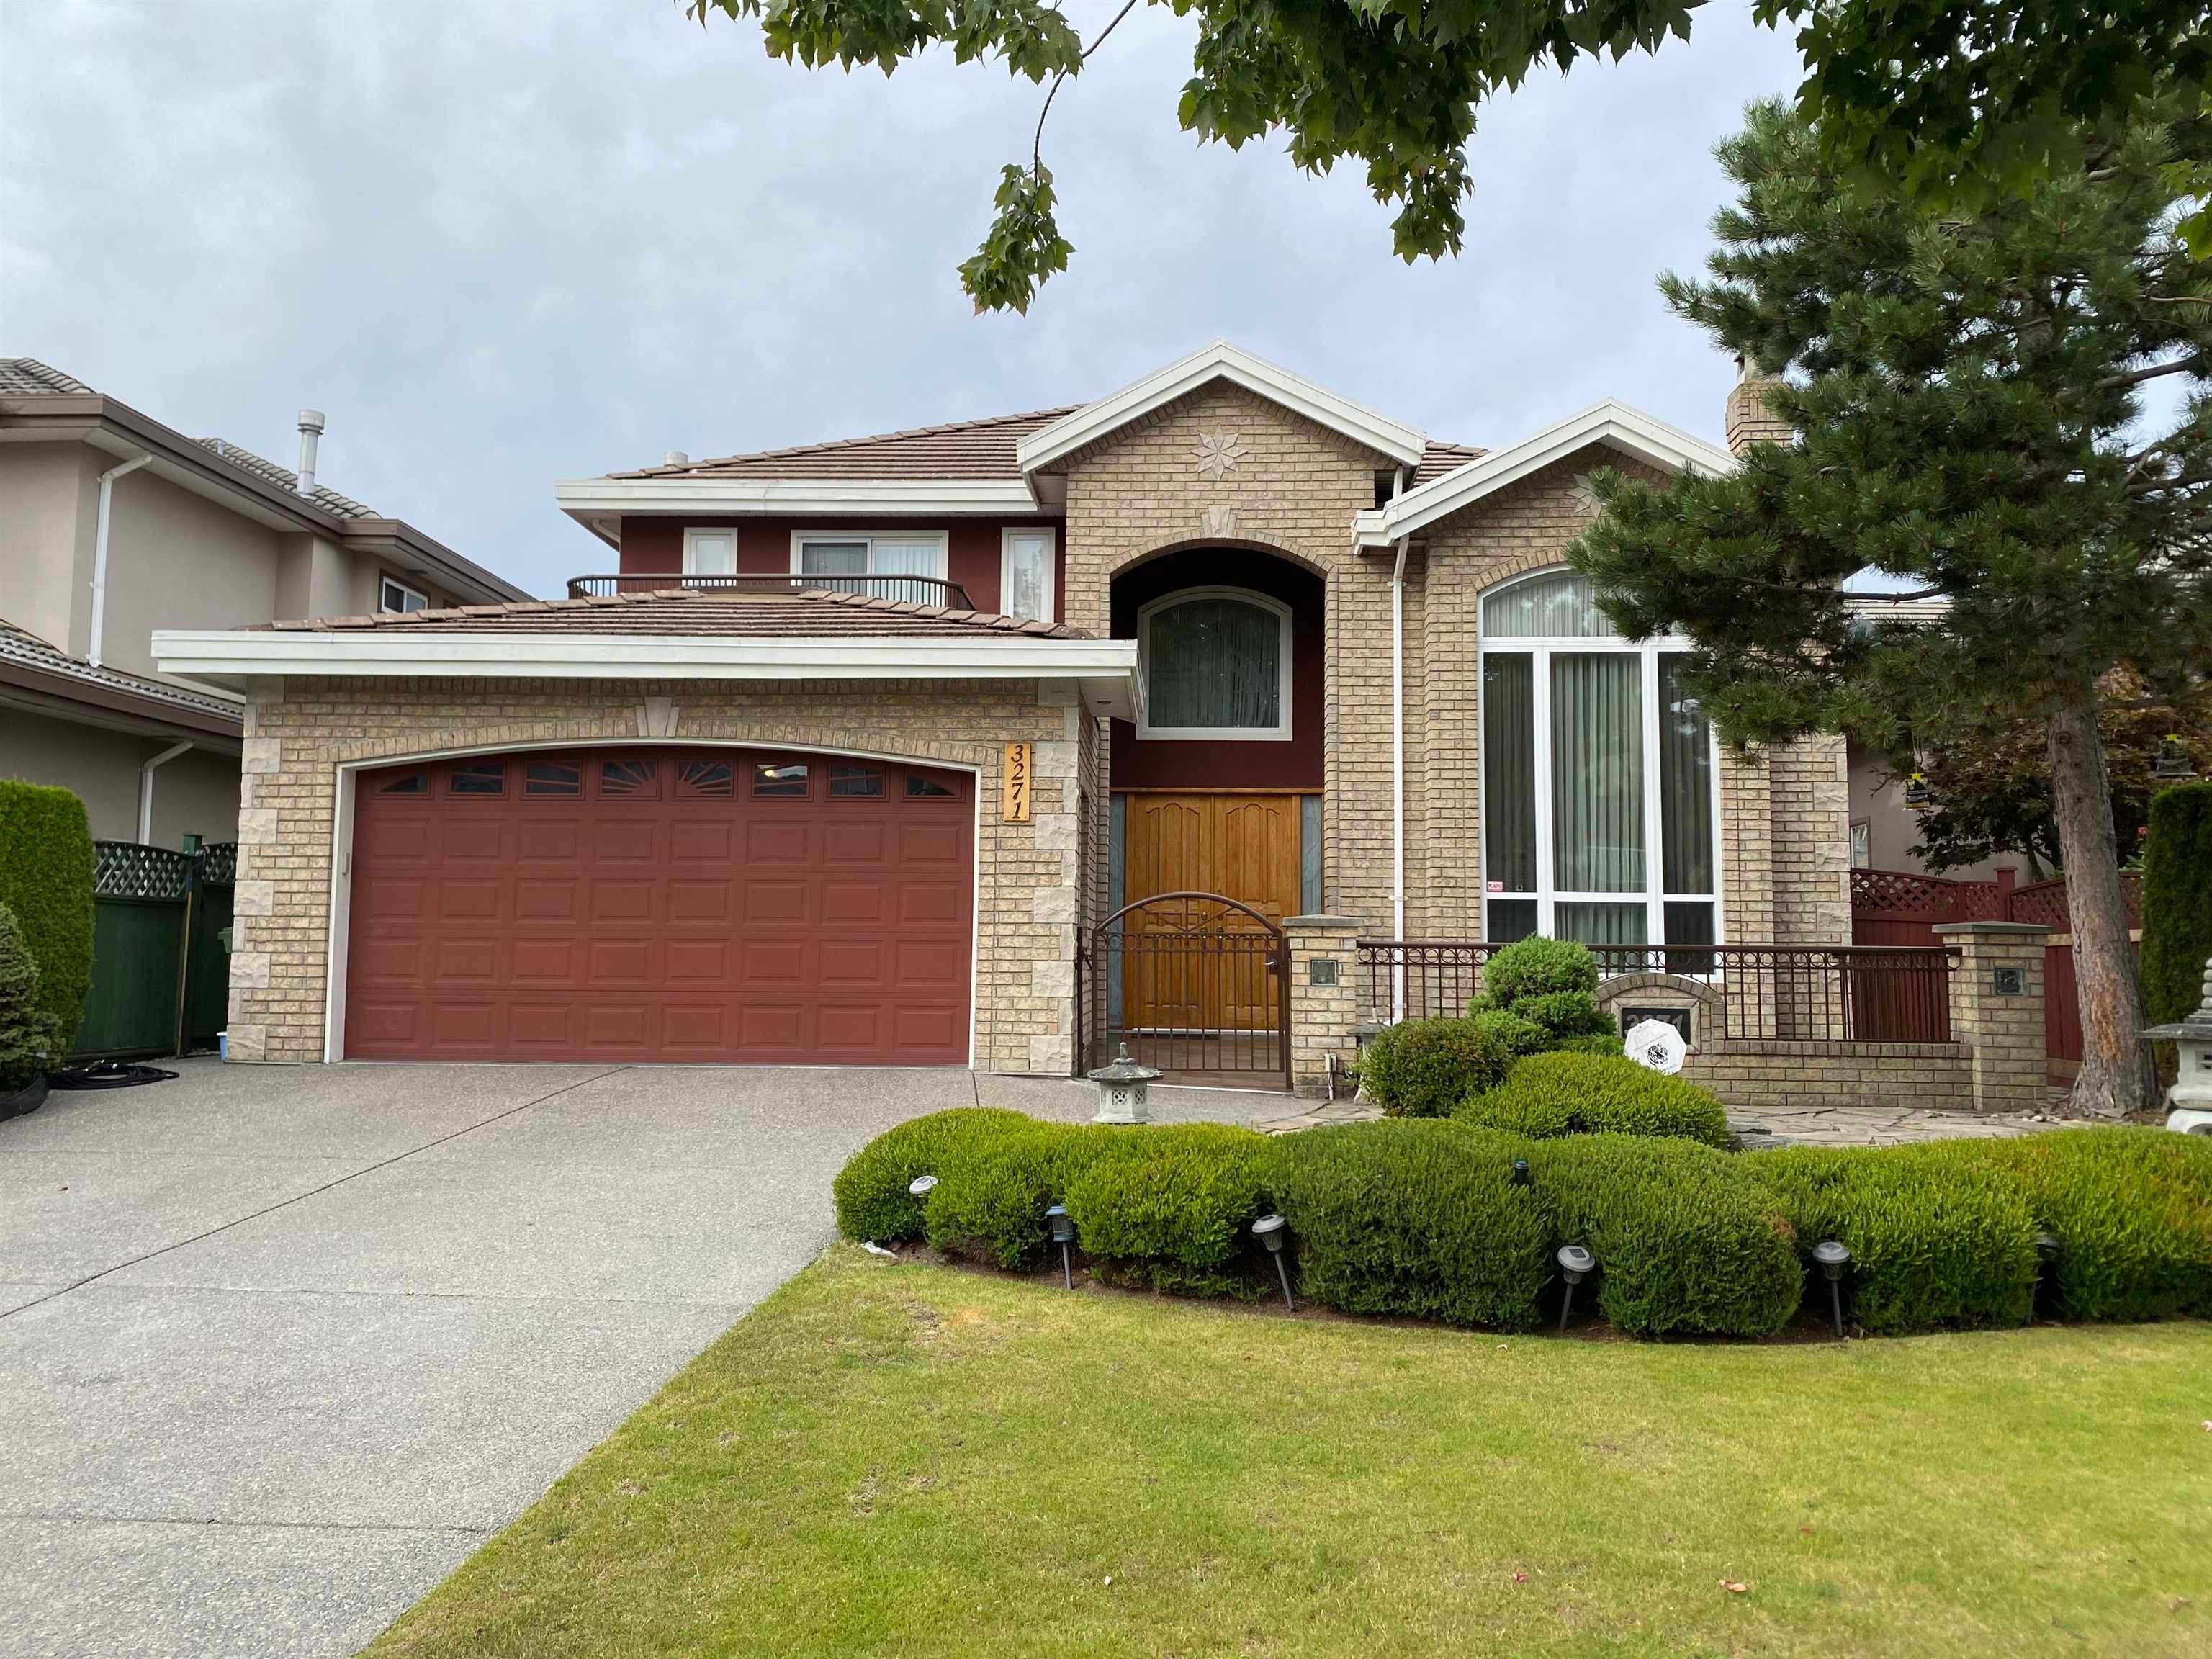 3271 TOLMIE AVENUE - Terra Nova House/Single Family for sale, 5 Bedrooms (R2616383)